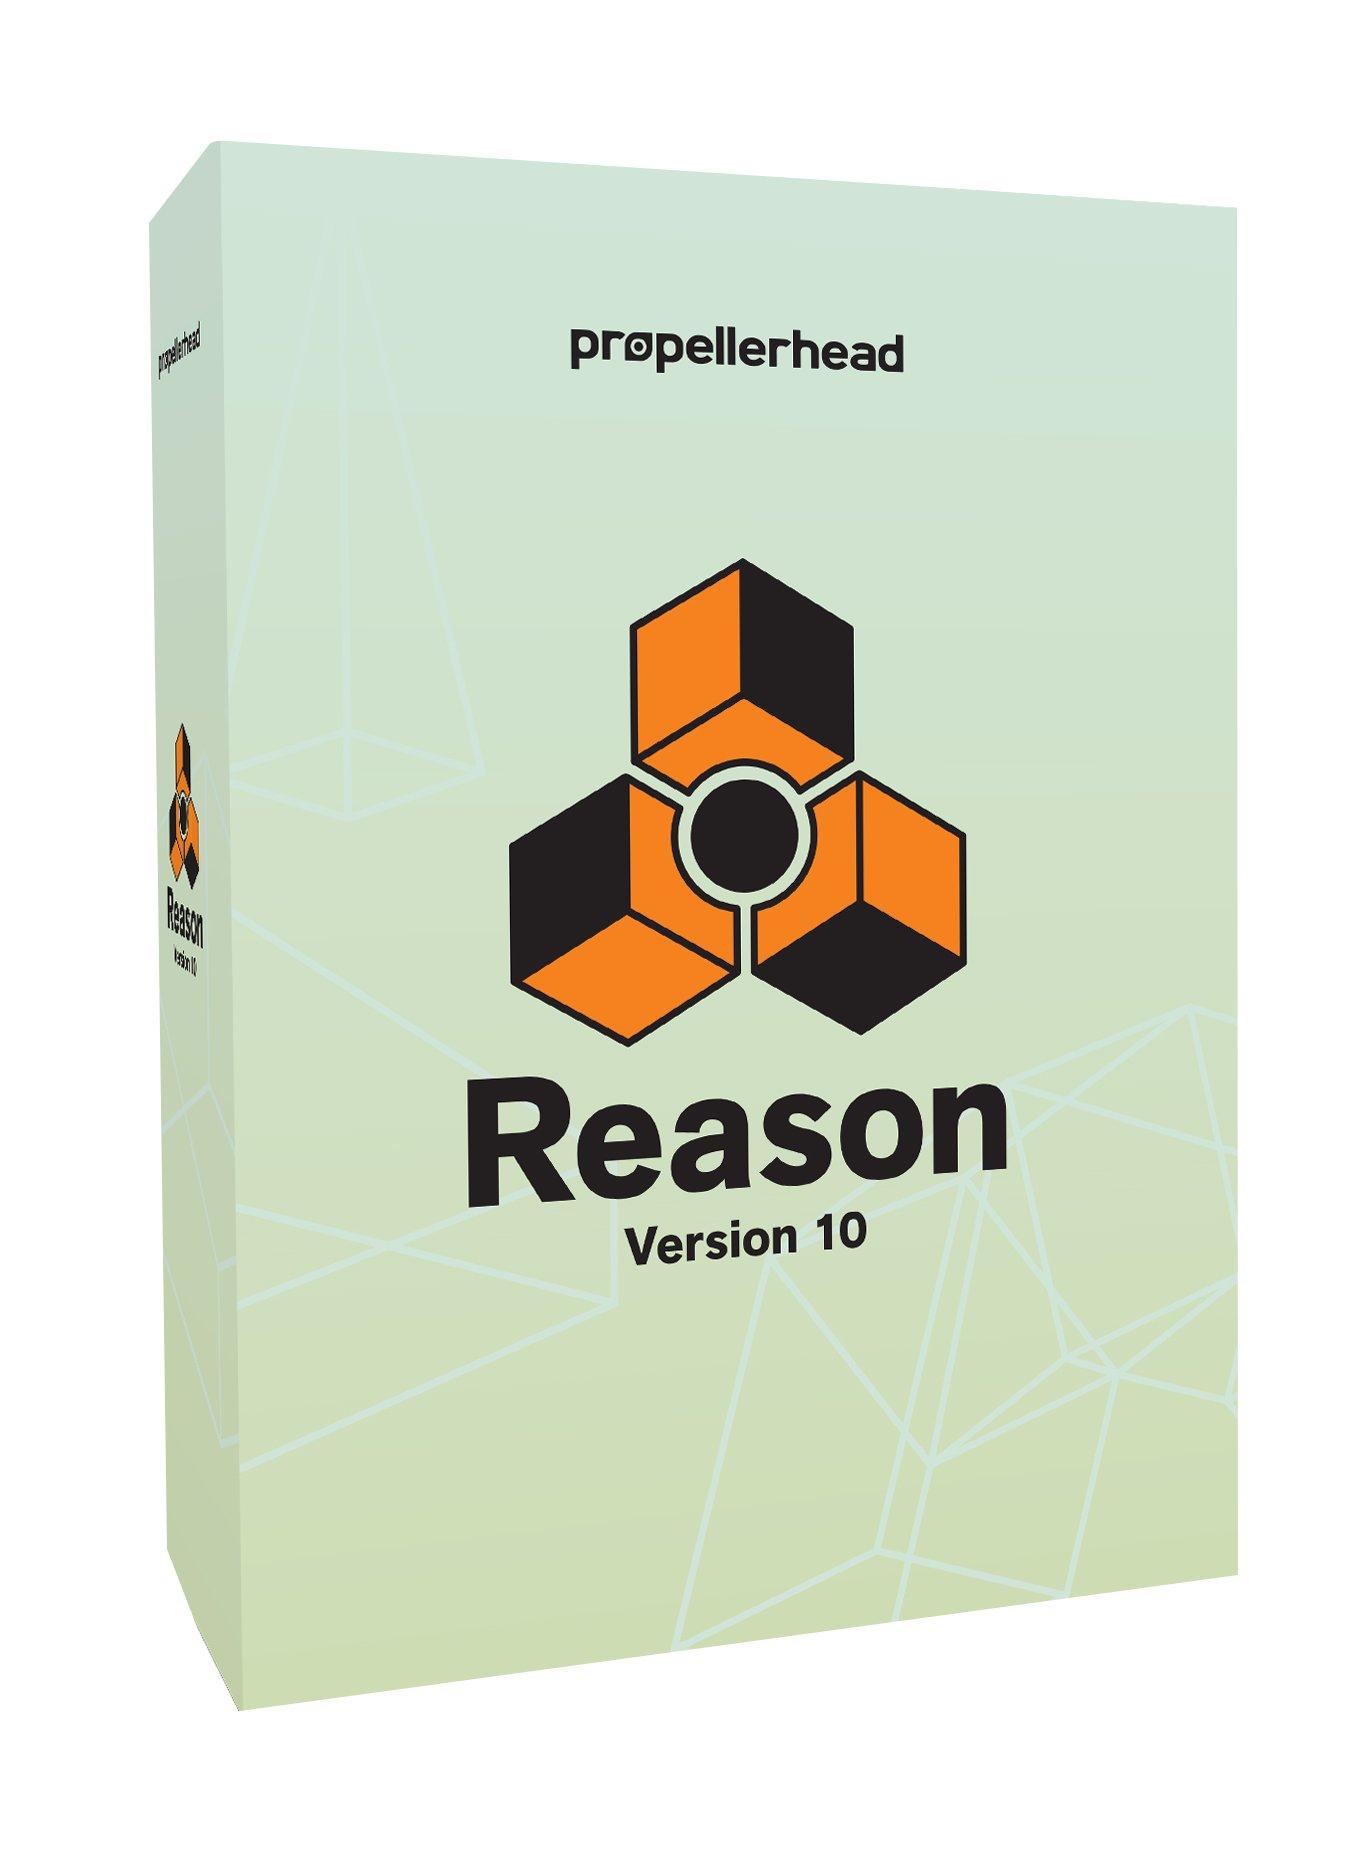 Propellerhead Upgrade to Reason 10 (101000090)